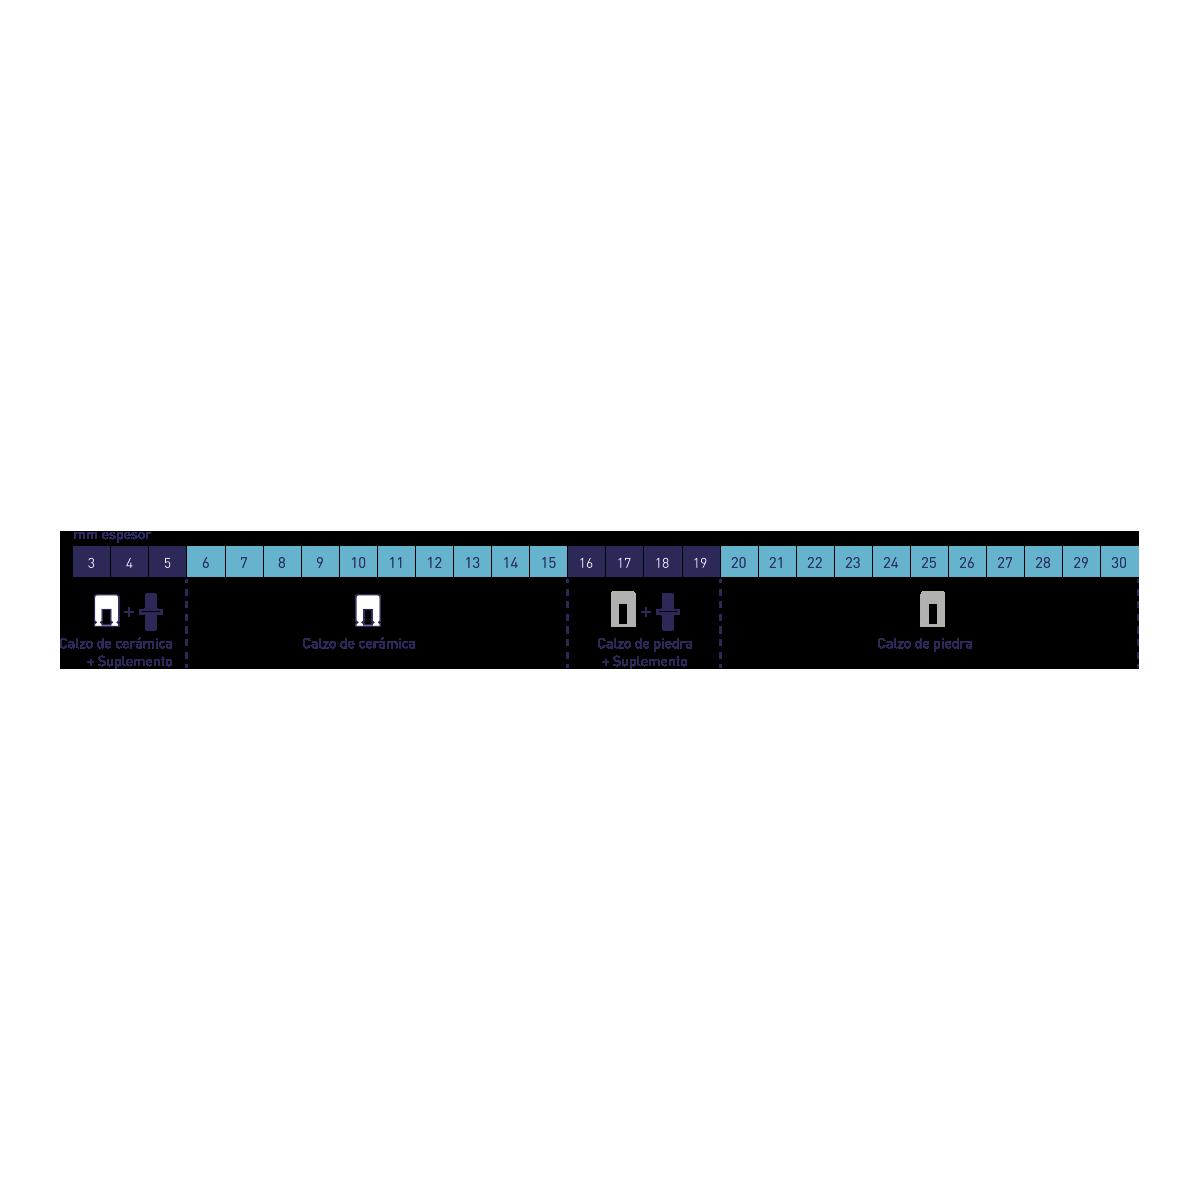 Kit de nivelación sistemas Peygran Peygran